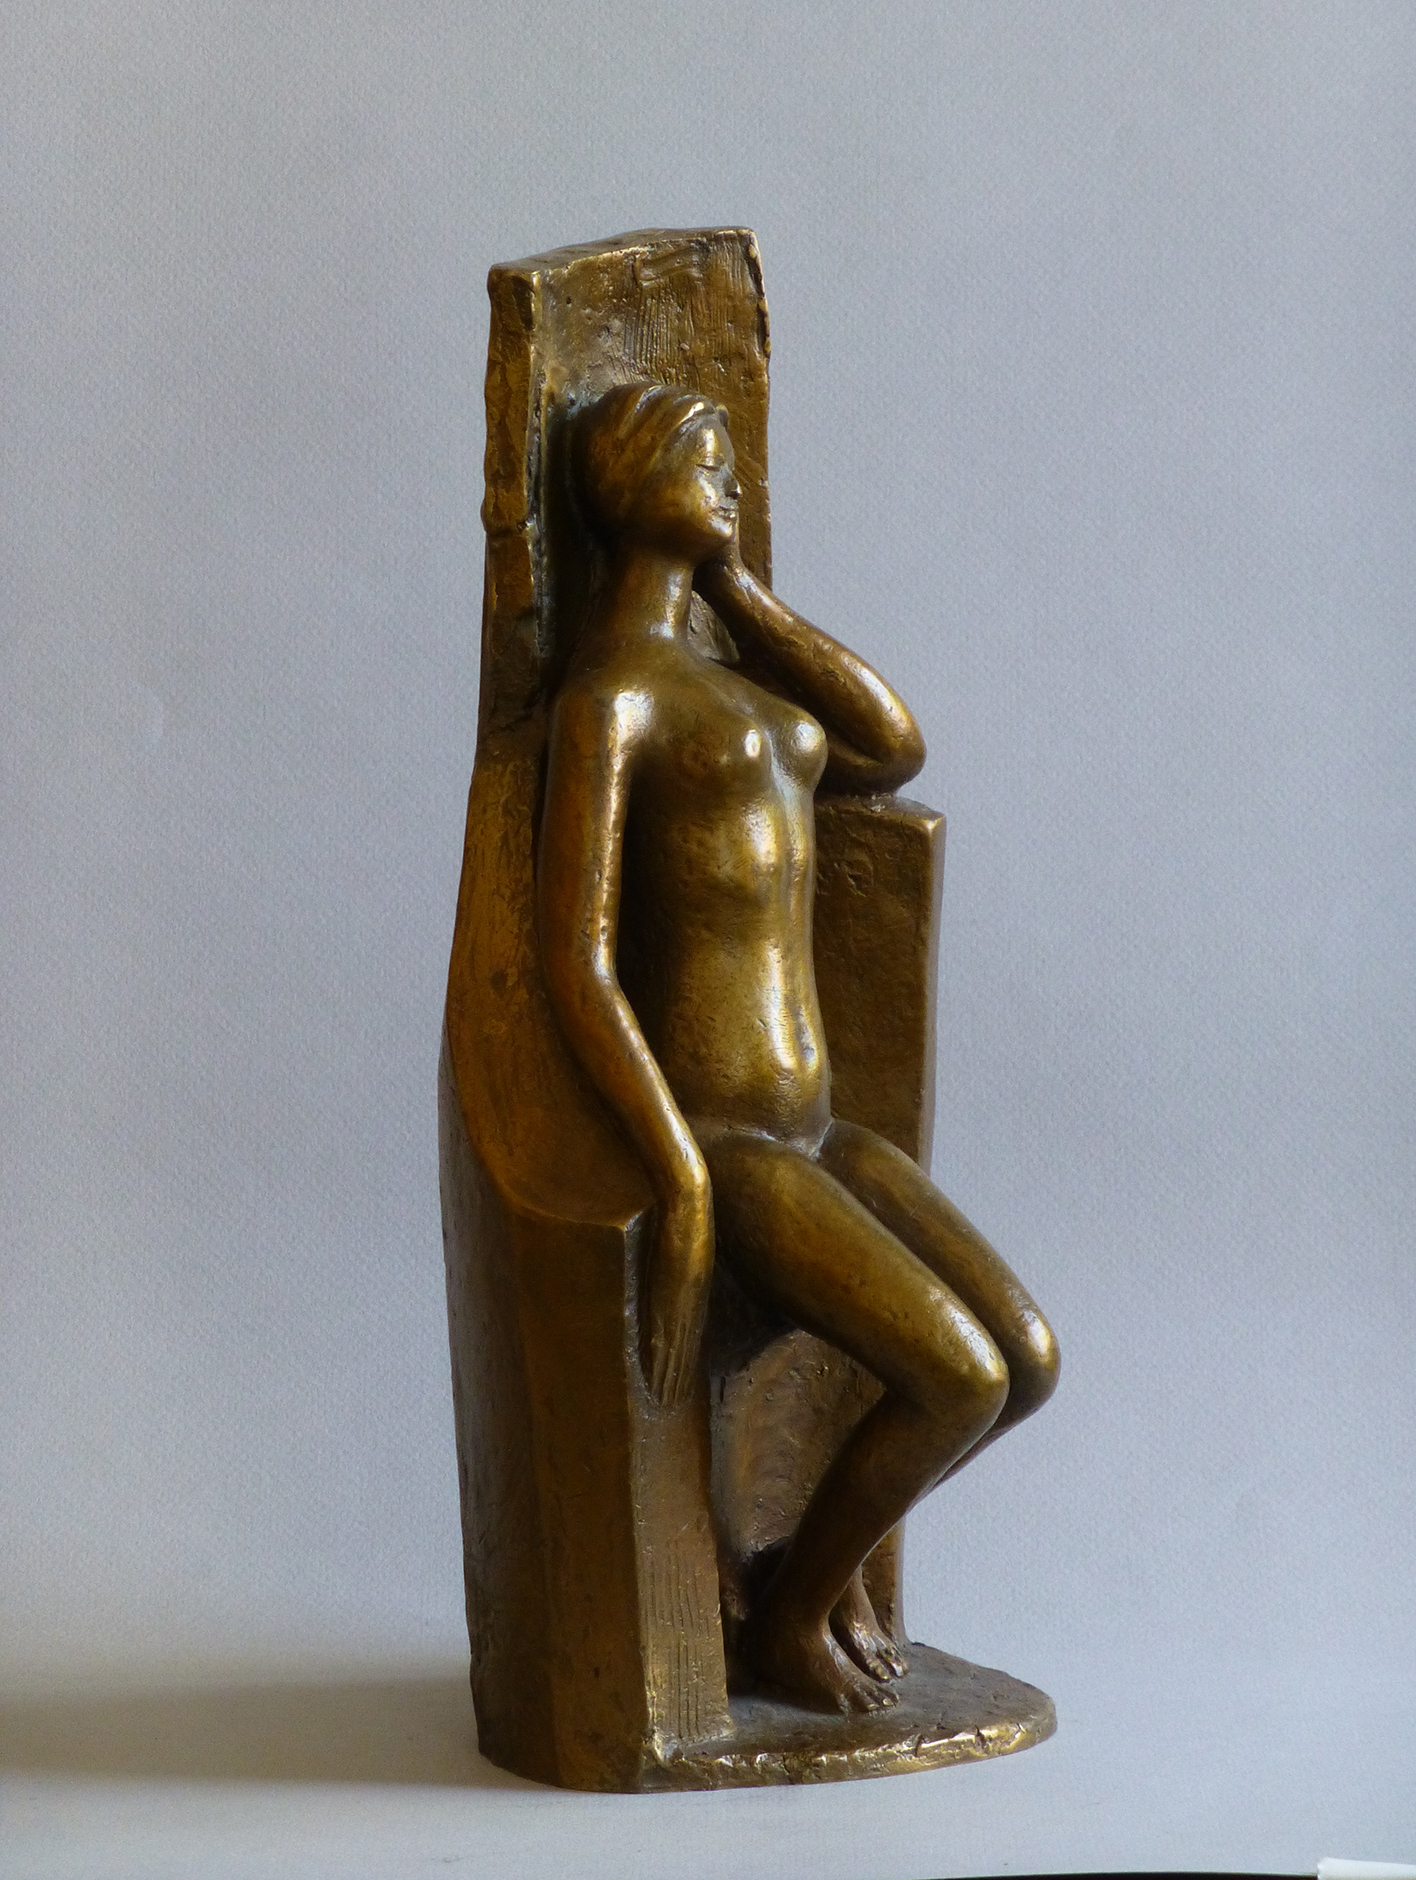 1994, Mujer sentada durmiendo, Bronce, 34x15x16 cms. 1994